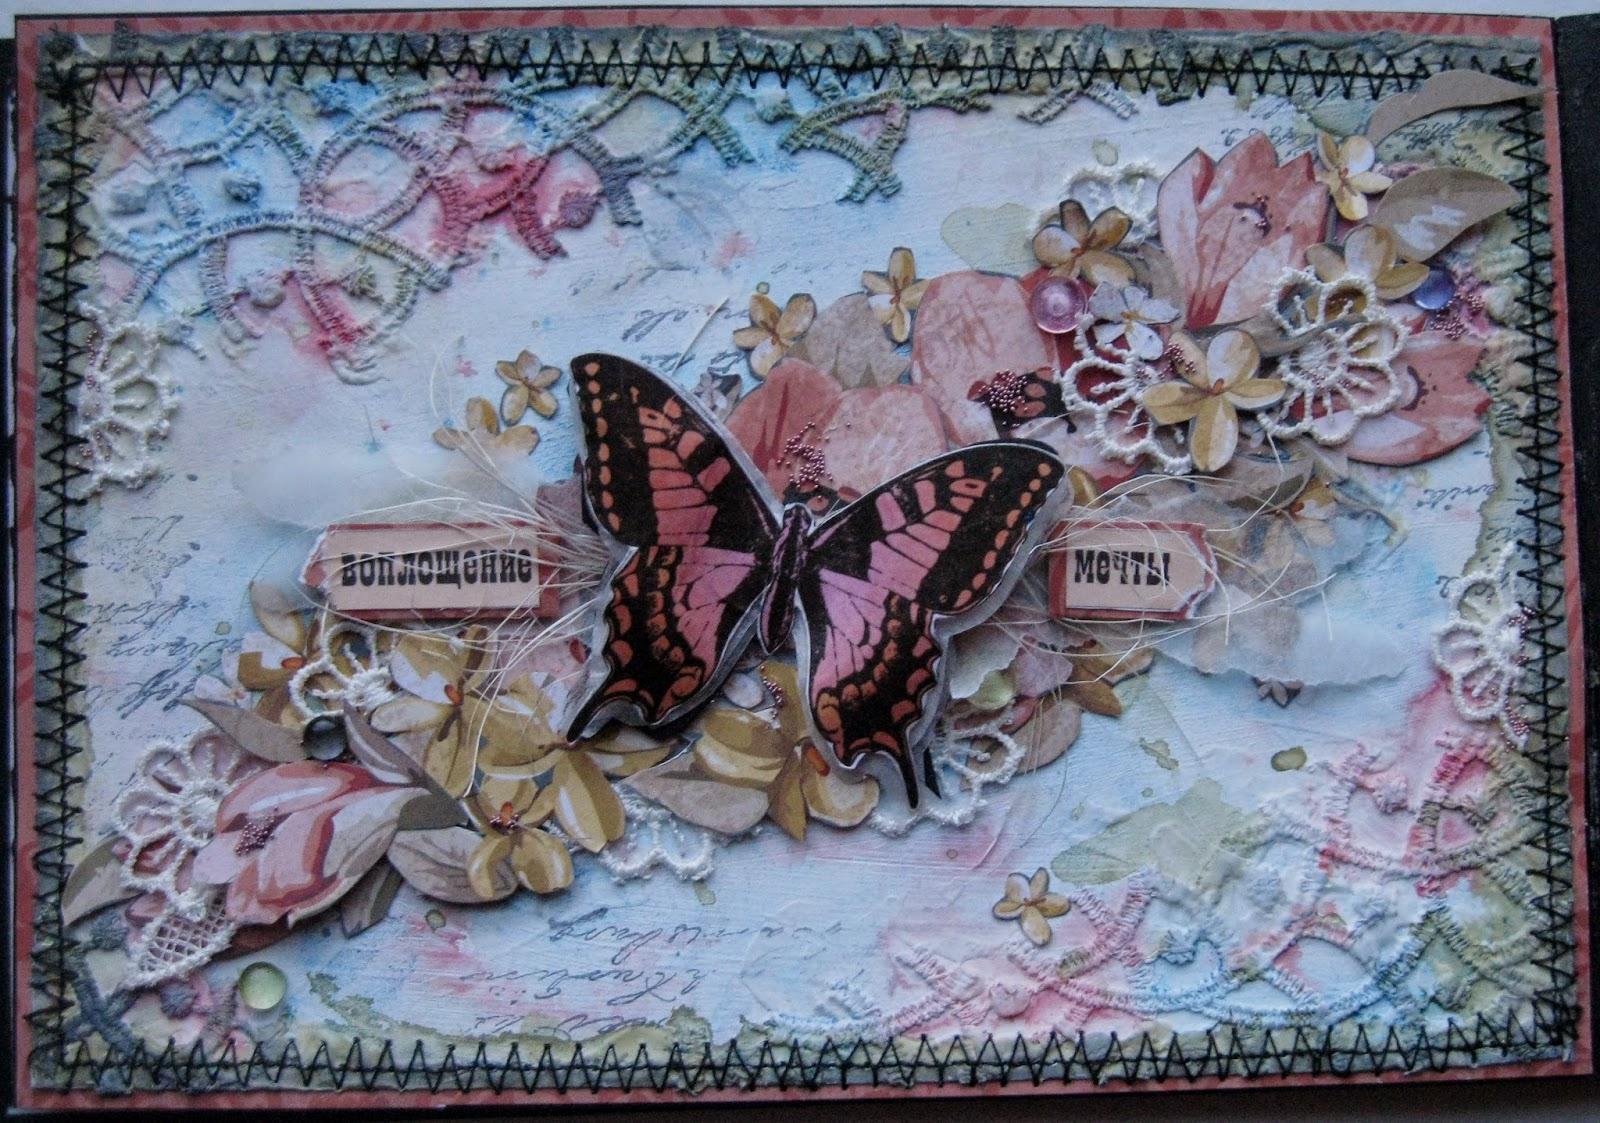 артбук,страничка,миксд медиа,скрам,бабочка,краски,трафарет,цветы